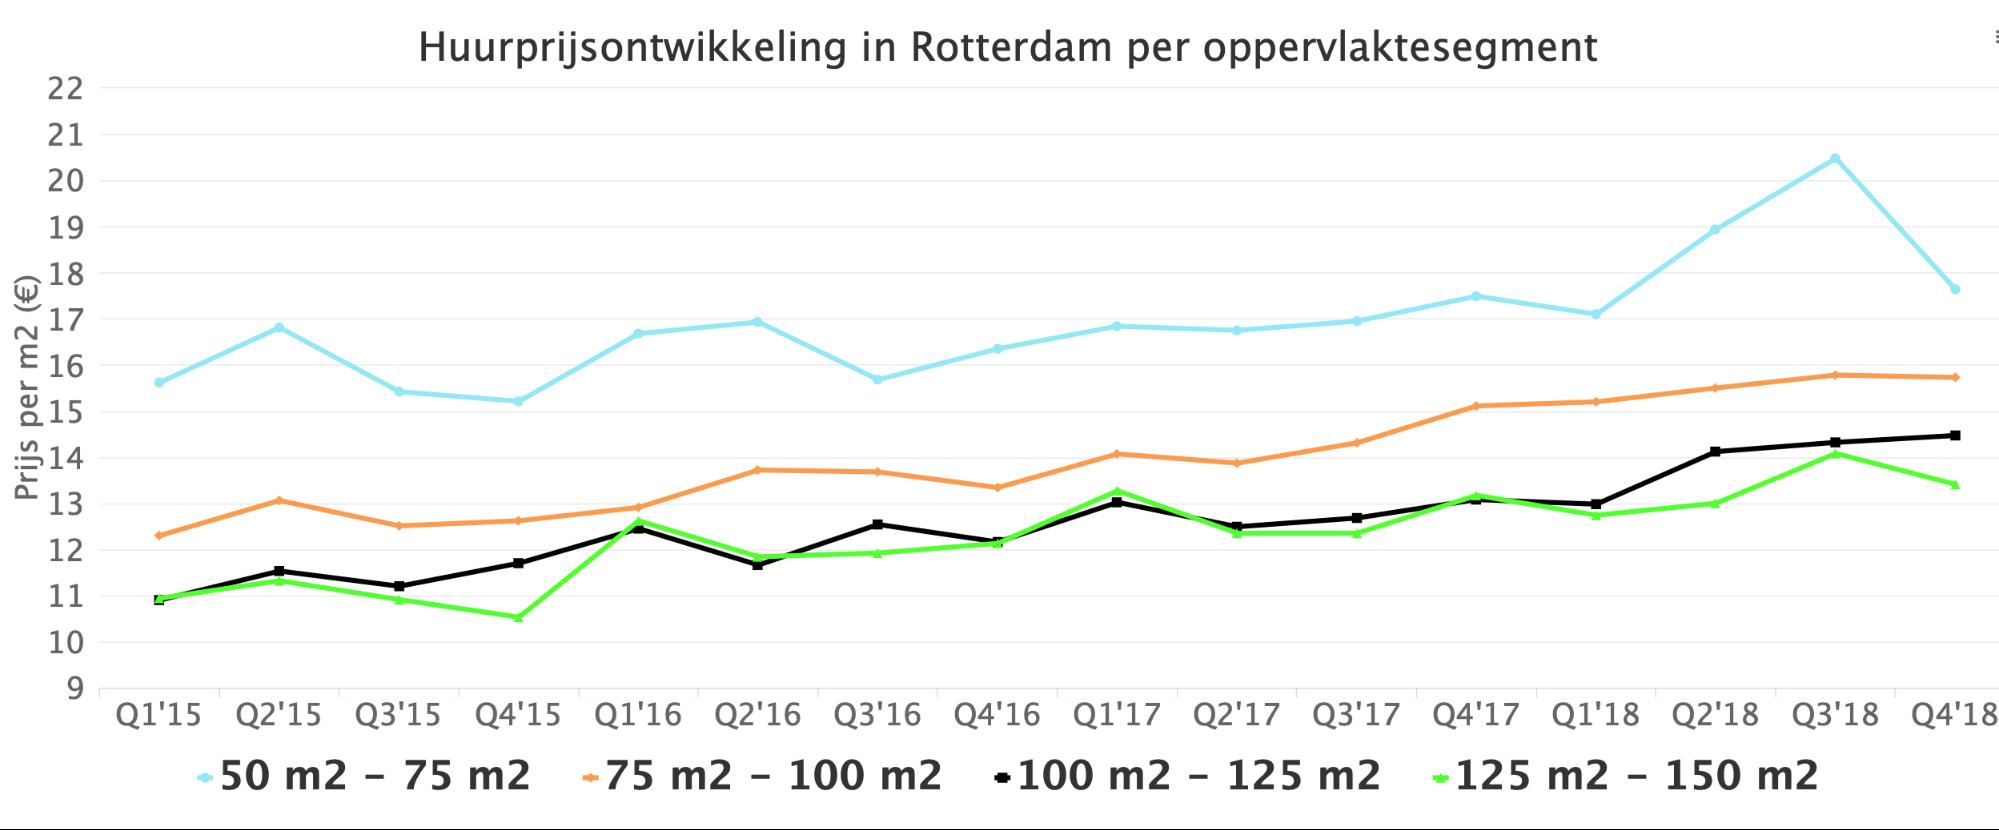 Huurprijsontwikkeling in Rotterdam oppervlaktesegment